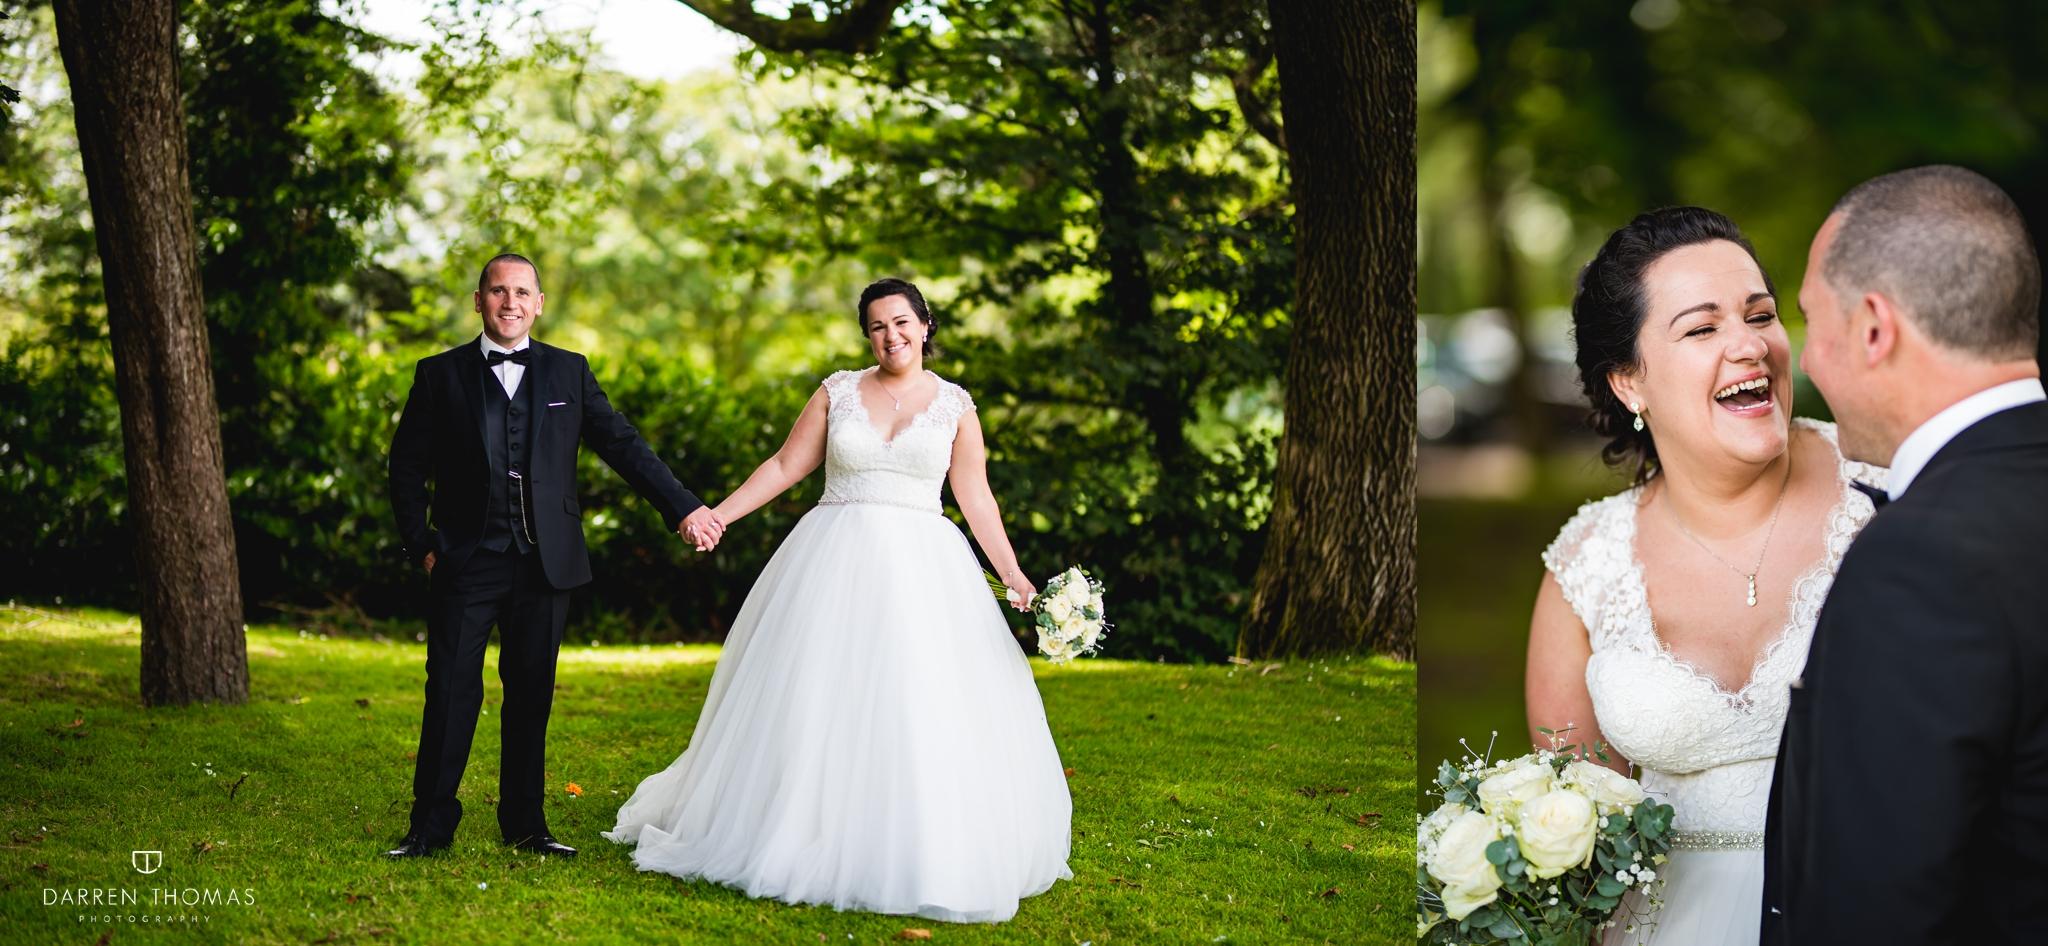 Llechwen-hall-wedding-photography14.jpg